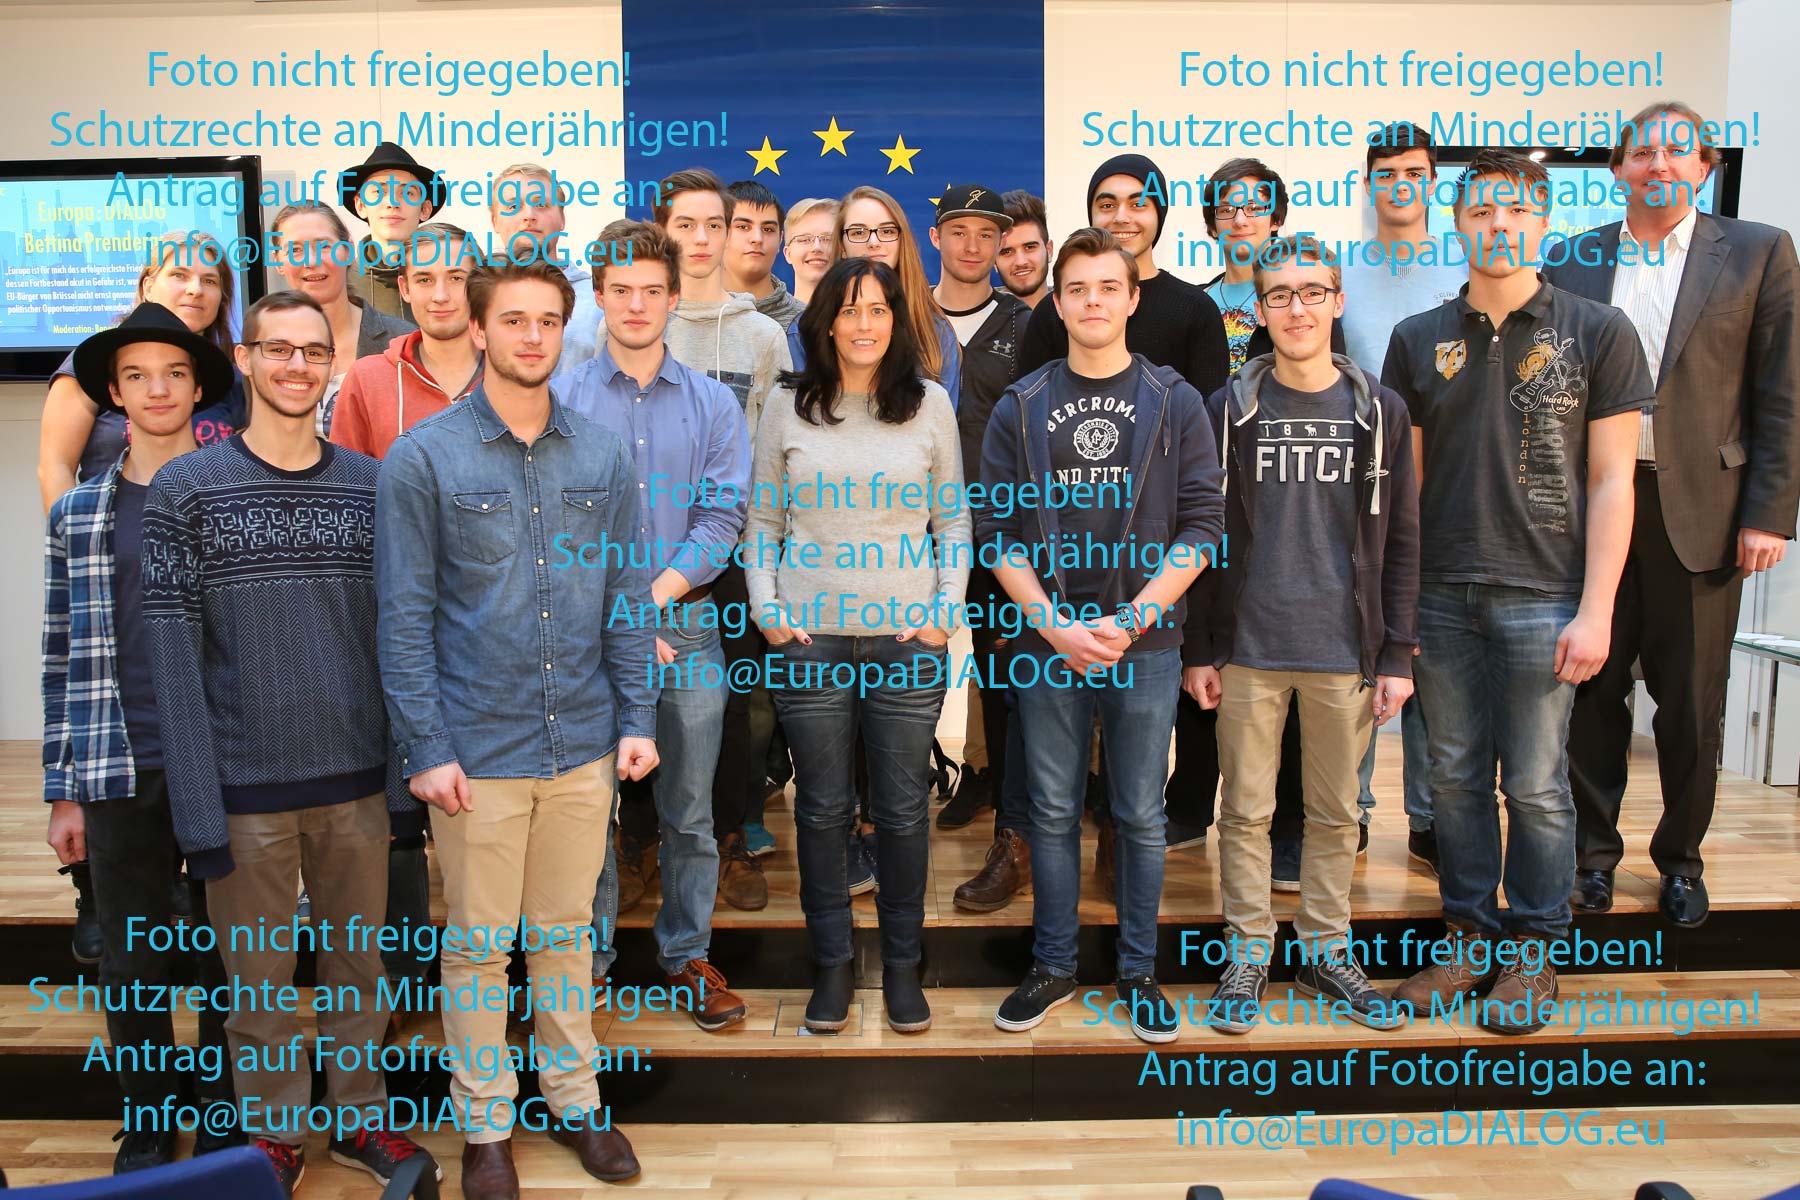 europadialog_bettina-prendergast_s_e05_schulzentrum-ungarg-htl_021843_-katharina-schiffl__